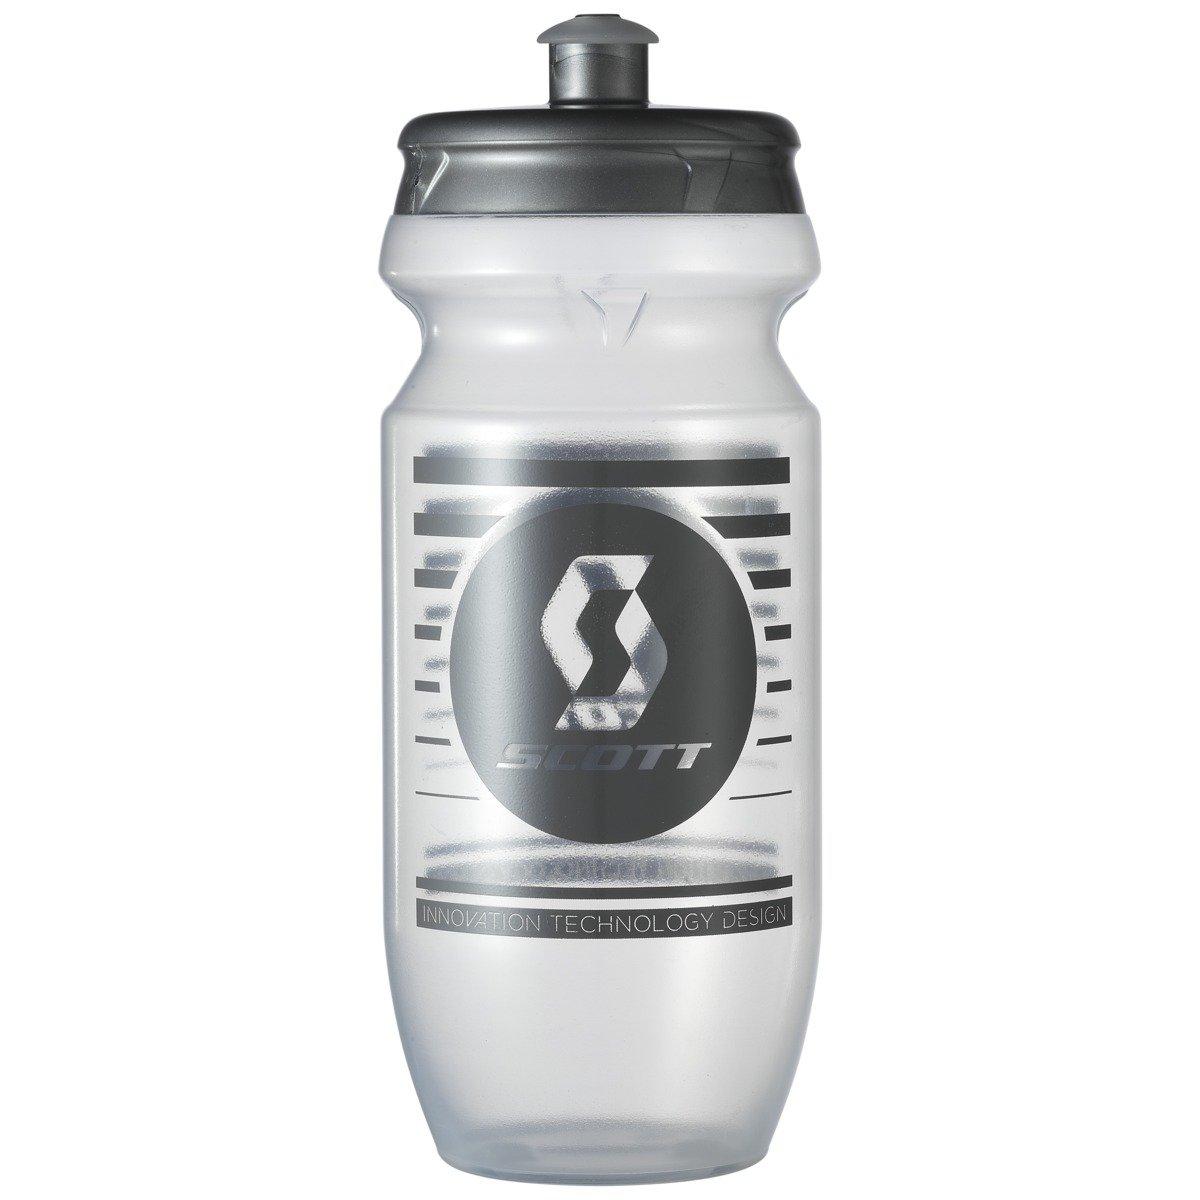 Scott Water Bottle Corporate G3Pak de 9Anthracite/White, Unisex, clear/anthracite